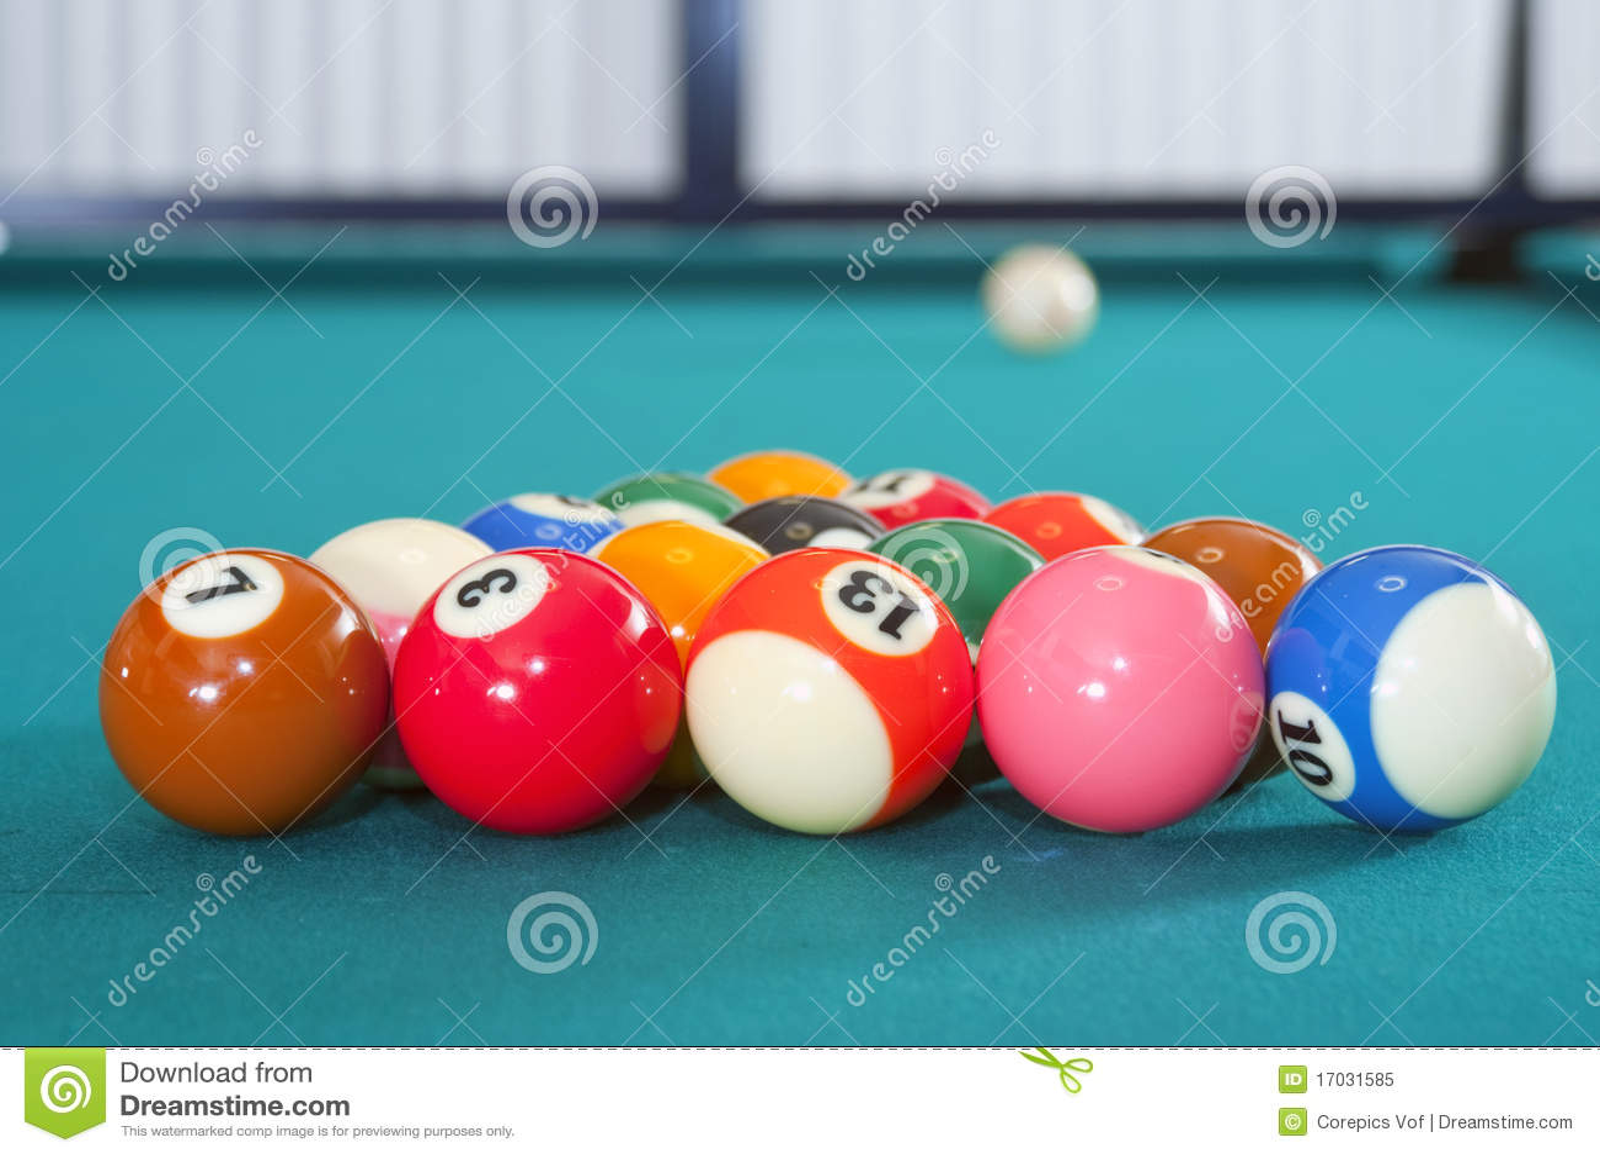 Eight Ball Pool Royalty Free Stock Photo - Image: 17031585